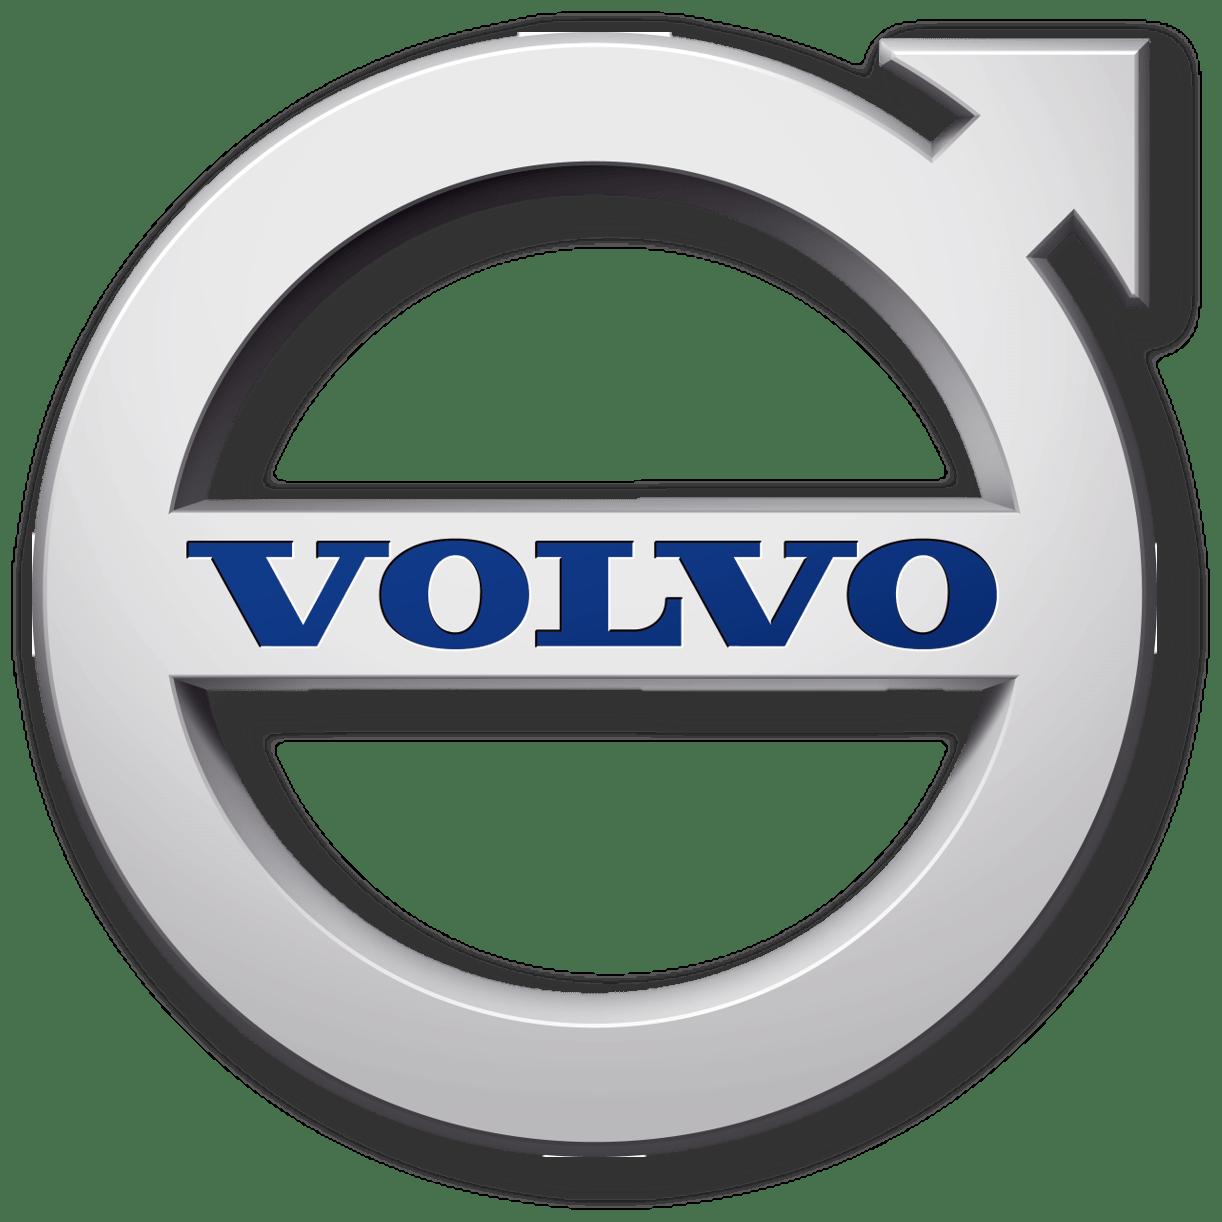 Vector Wiring Diagram Volvo Free Repair And Service Manuals Pdf Wiring Diagrams